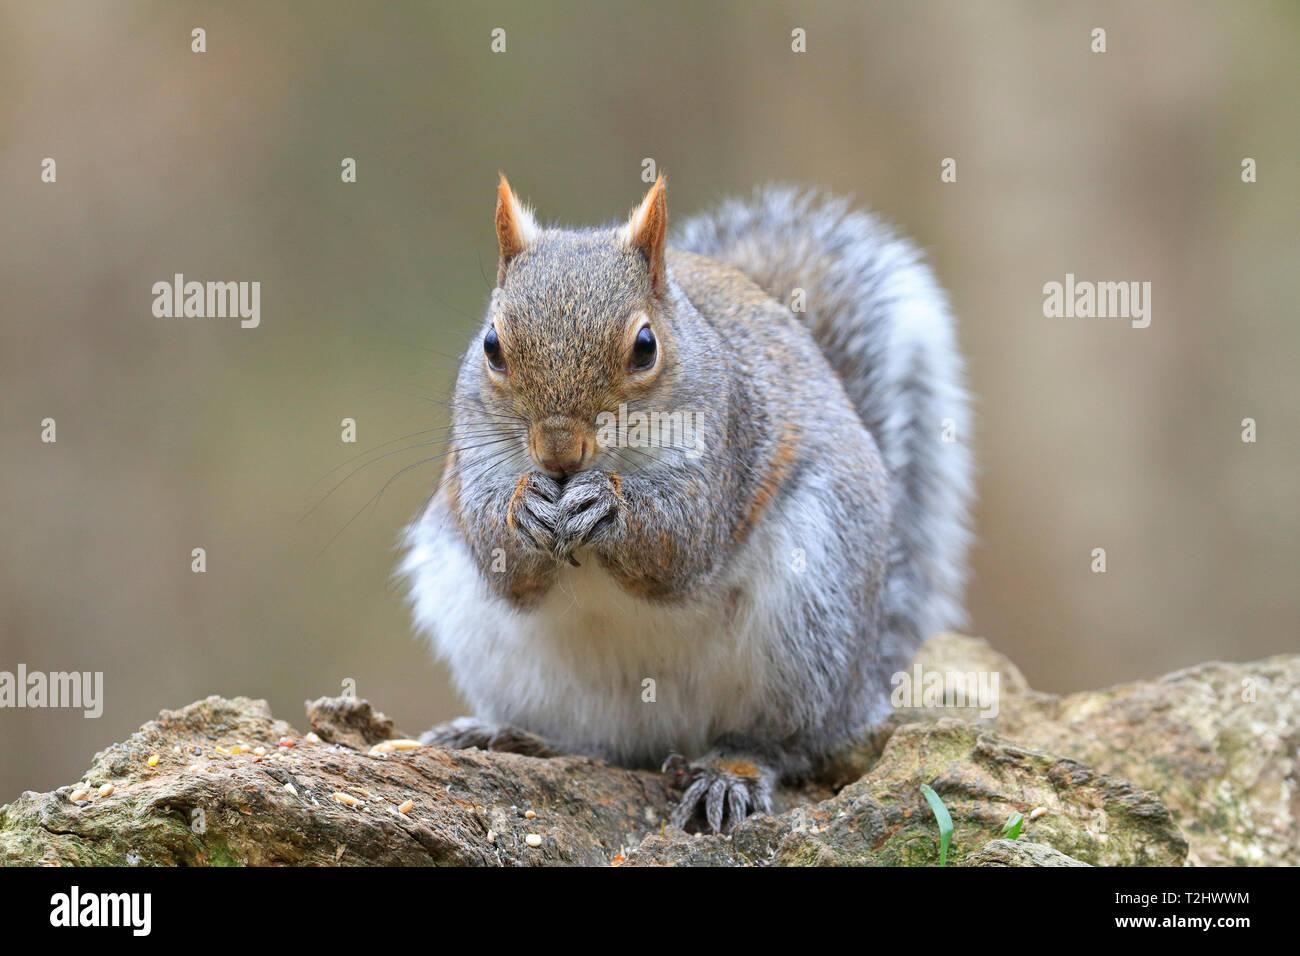 Eastern Grey Squirrel or Grey Squirrel, Sciurus carolinensis, front view eating seeds, England, UK. - Stock Image